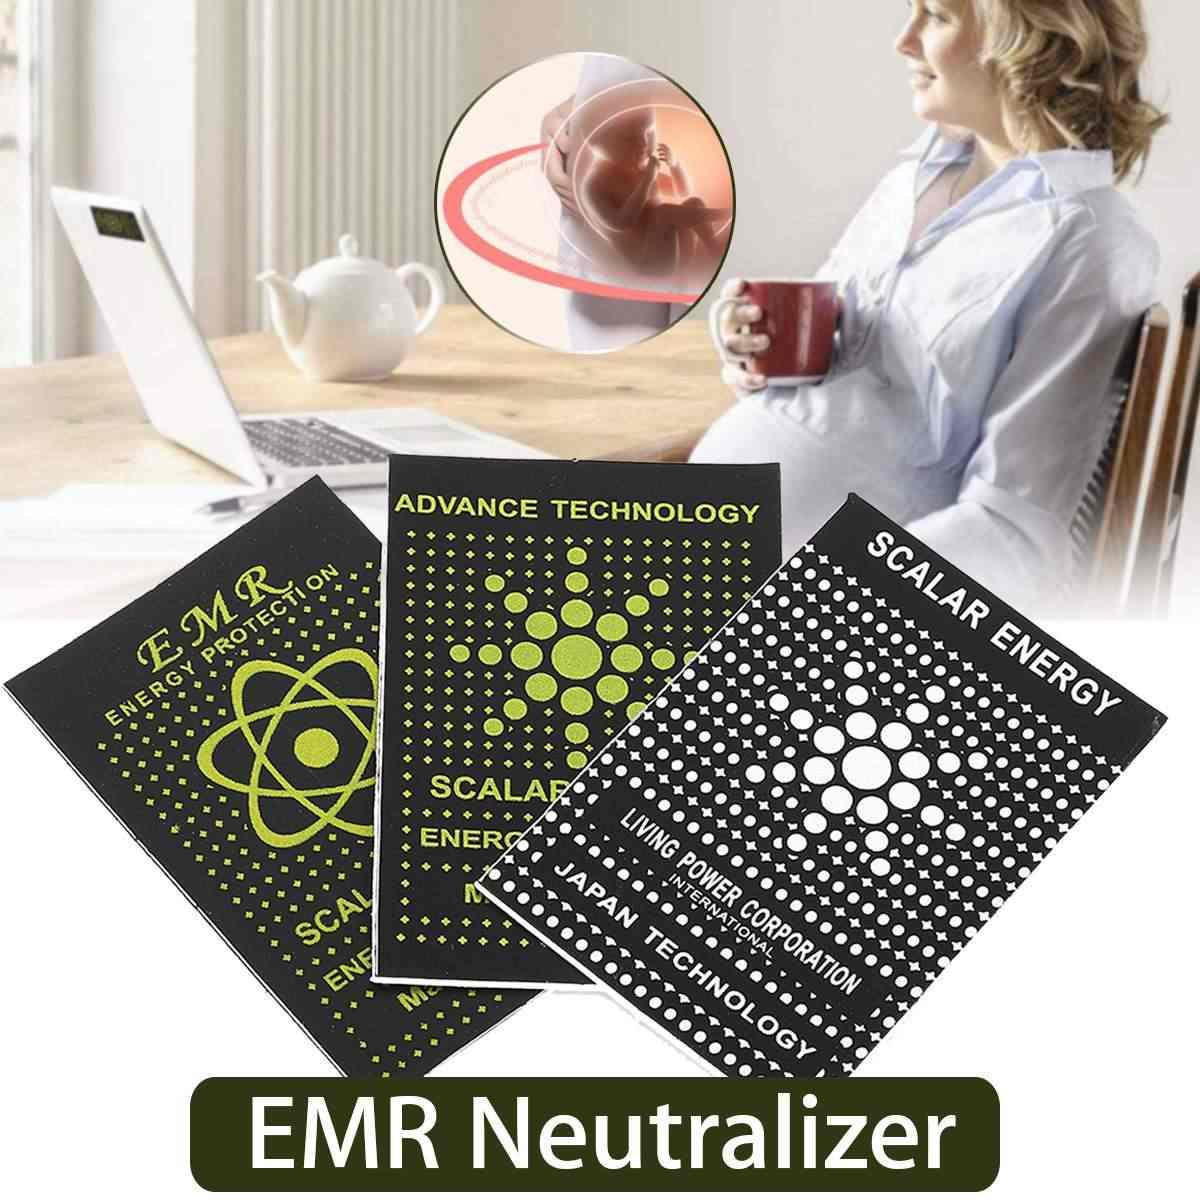 10 pcs EMR Scalar Energy โทรศัพท์สติกเกอร์ป้องกันรังสีชิป Shield Keep Health แล็ปท็อป EMP EMF สำหรับตั้งครรภ์ผู้หญิง